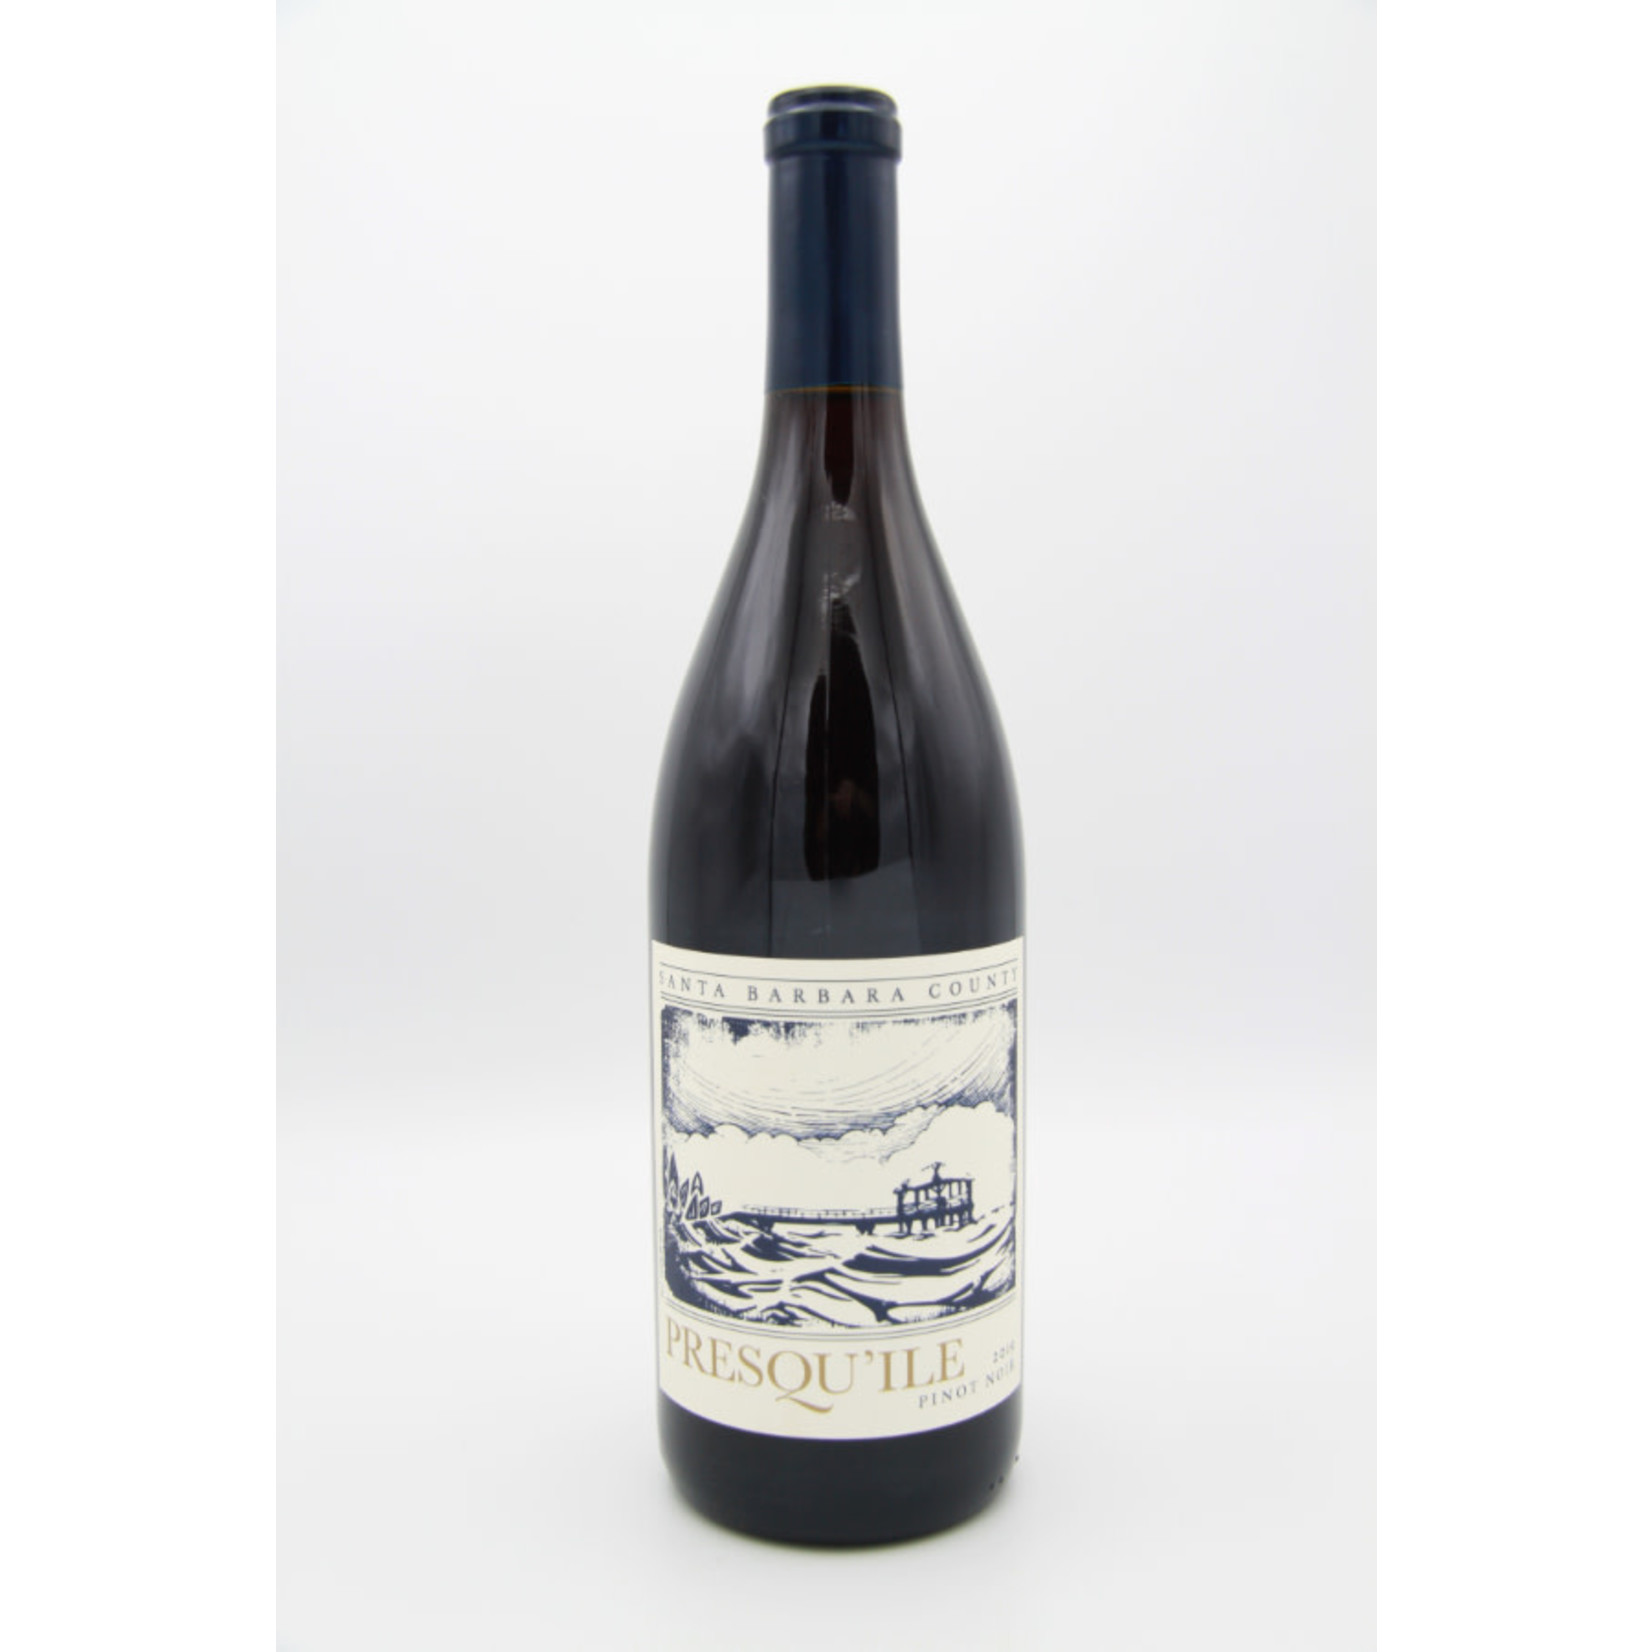 2019 Presqu'ile Santa Barbara County Pinot Noir